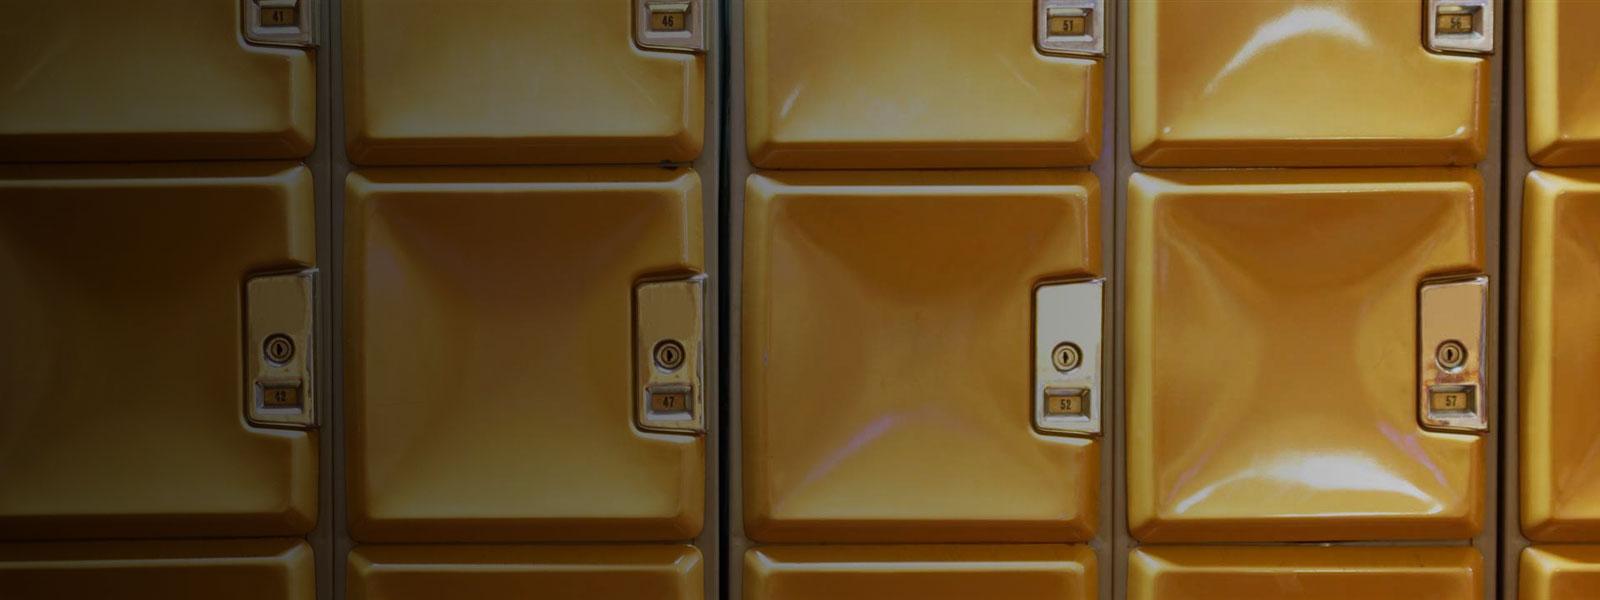 EU General Data Protection Regulation (GDPR): EU's new data protection law